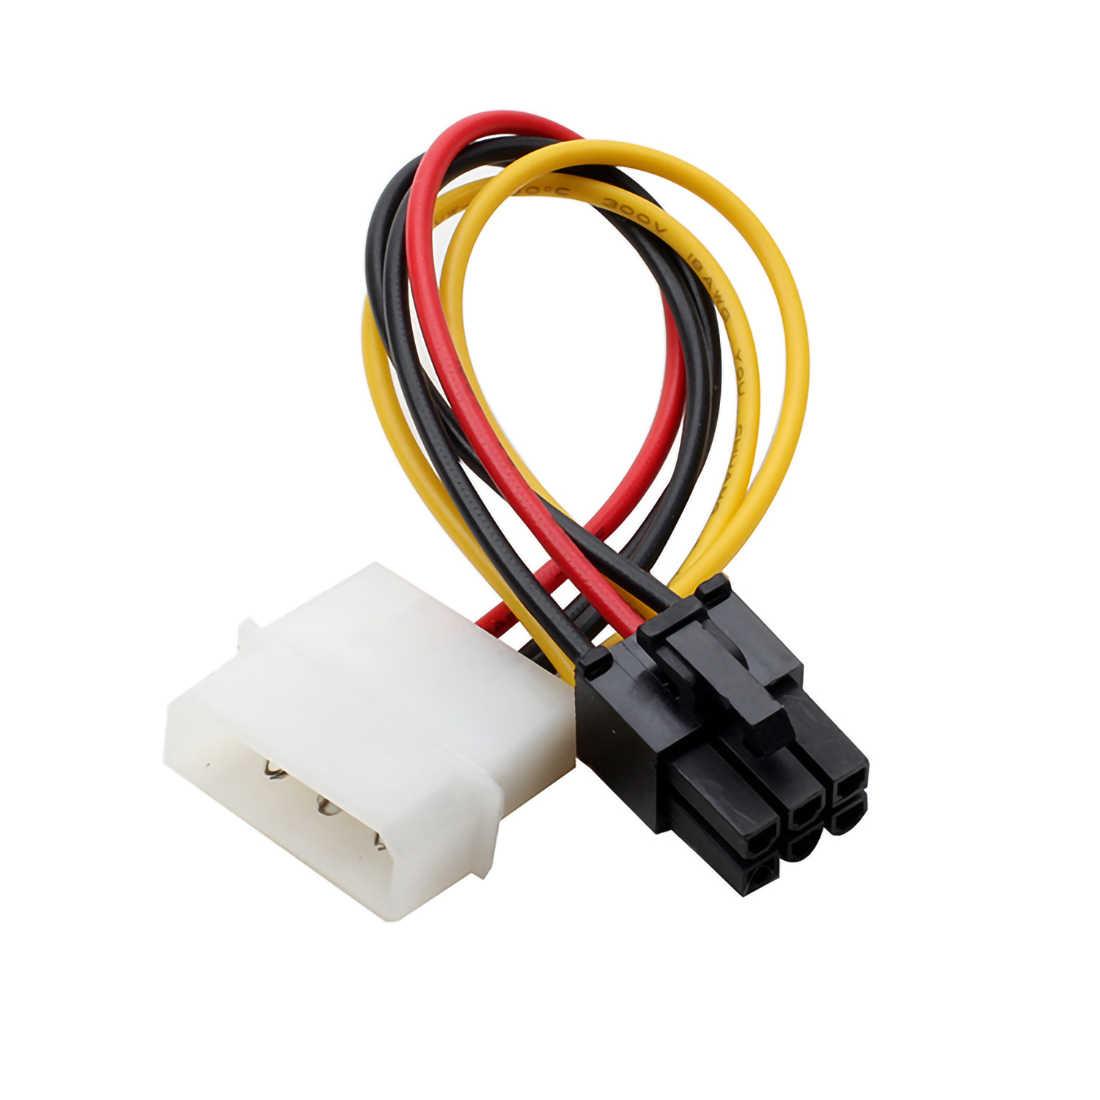 1x18 cm באיכות גבוהה 4 פינים עד 6 פינים PCI-Express PCIE גרפי כרטיס כוח ממיר כבל מתאם כבל